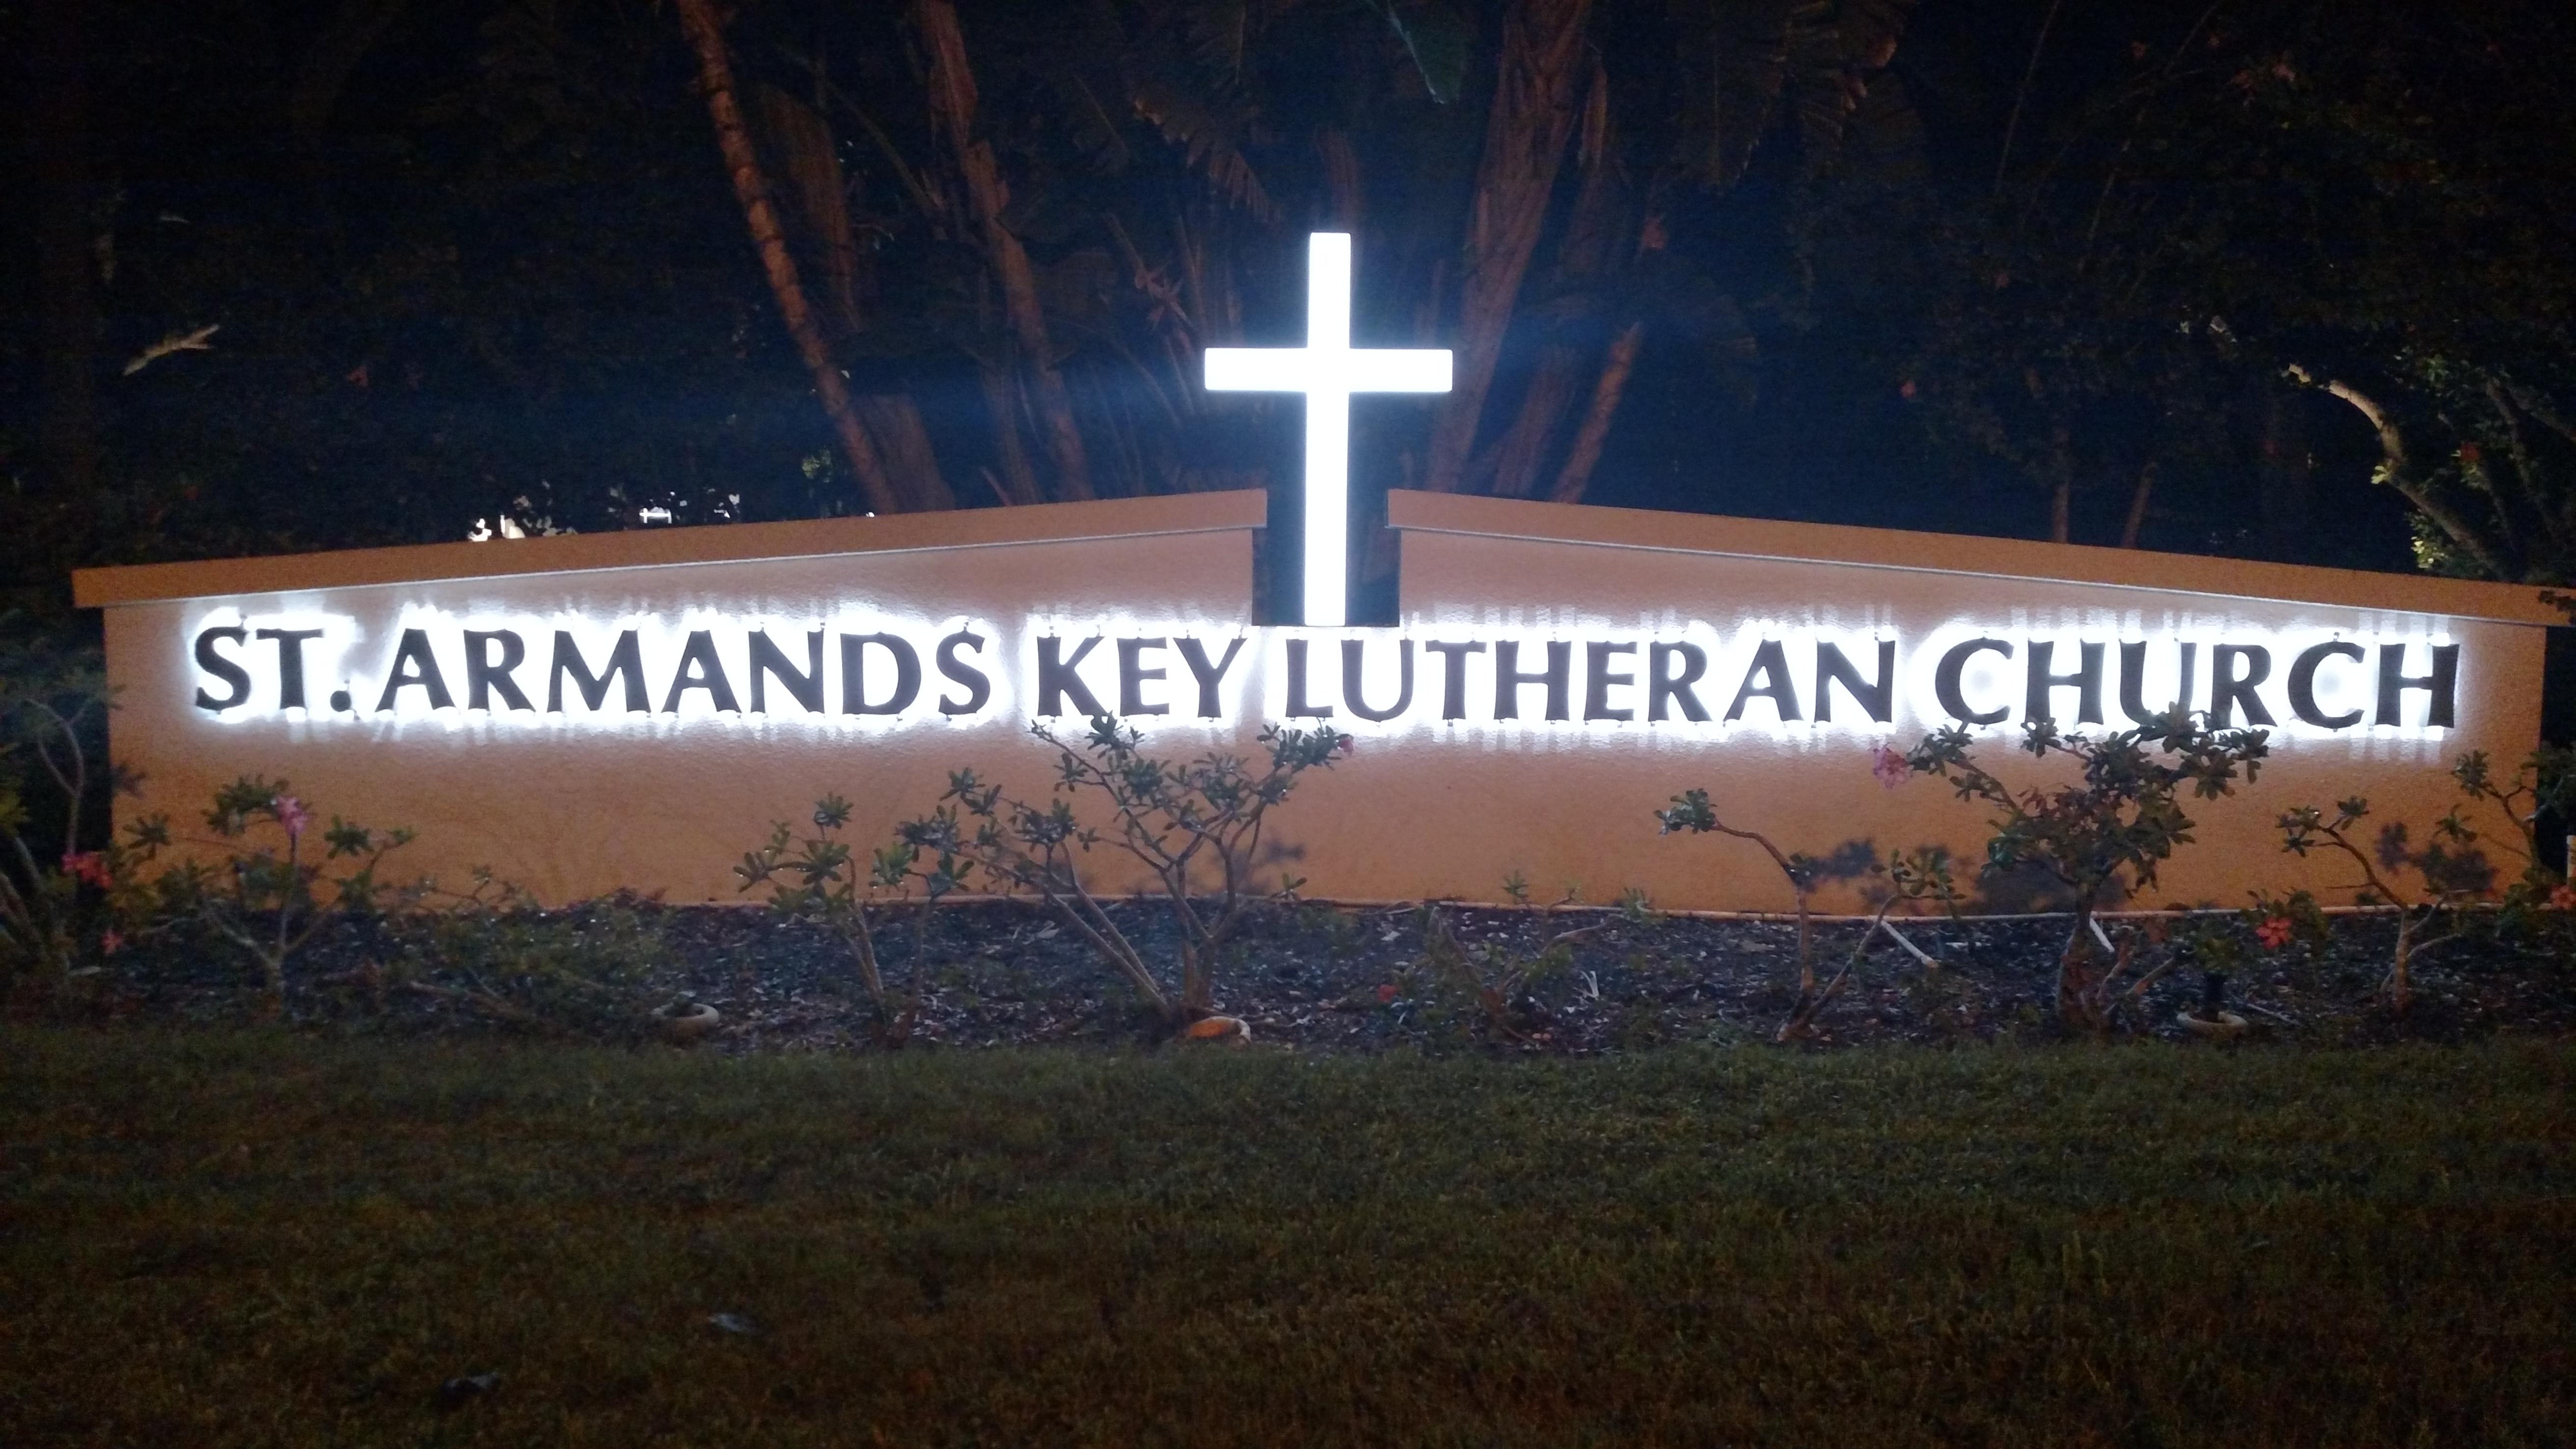 st-armands-key-church.jpg